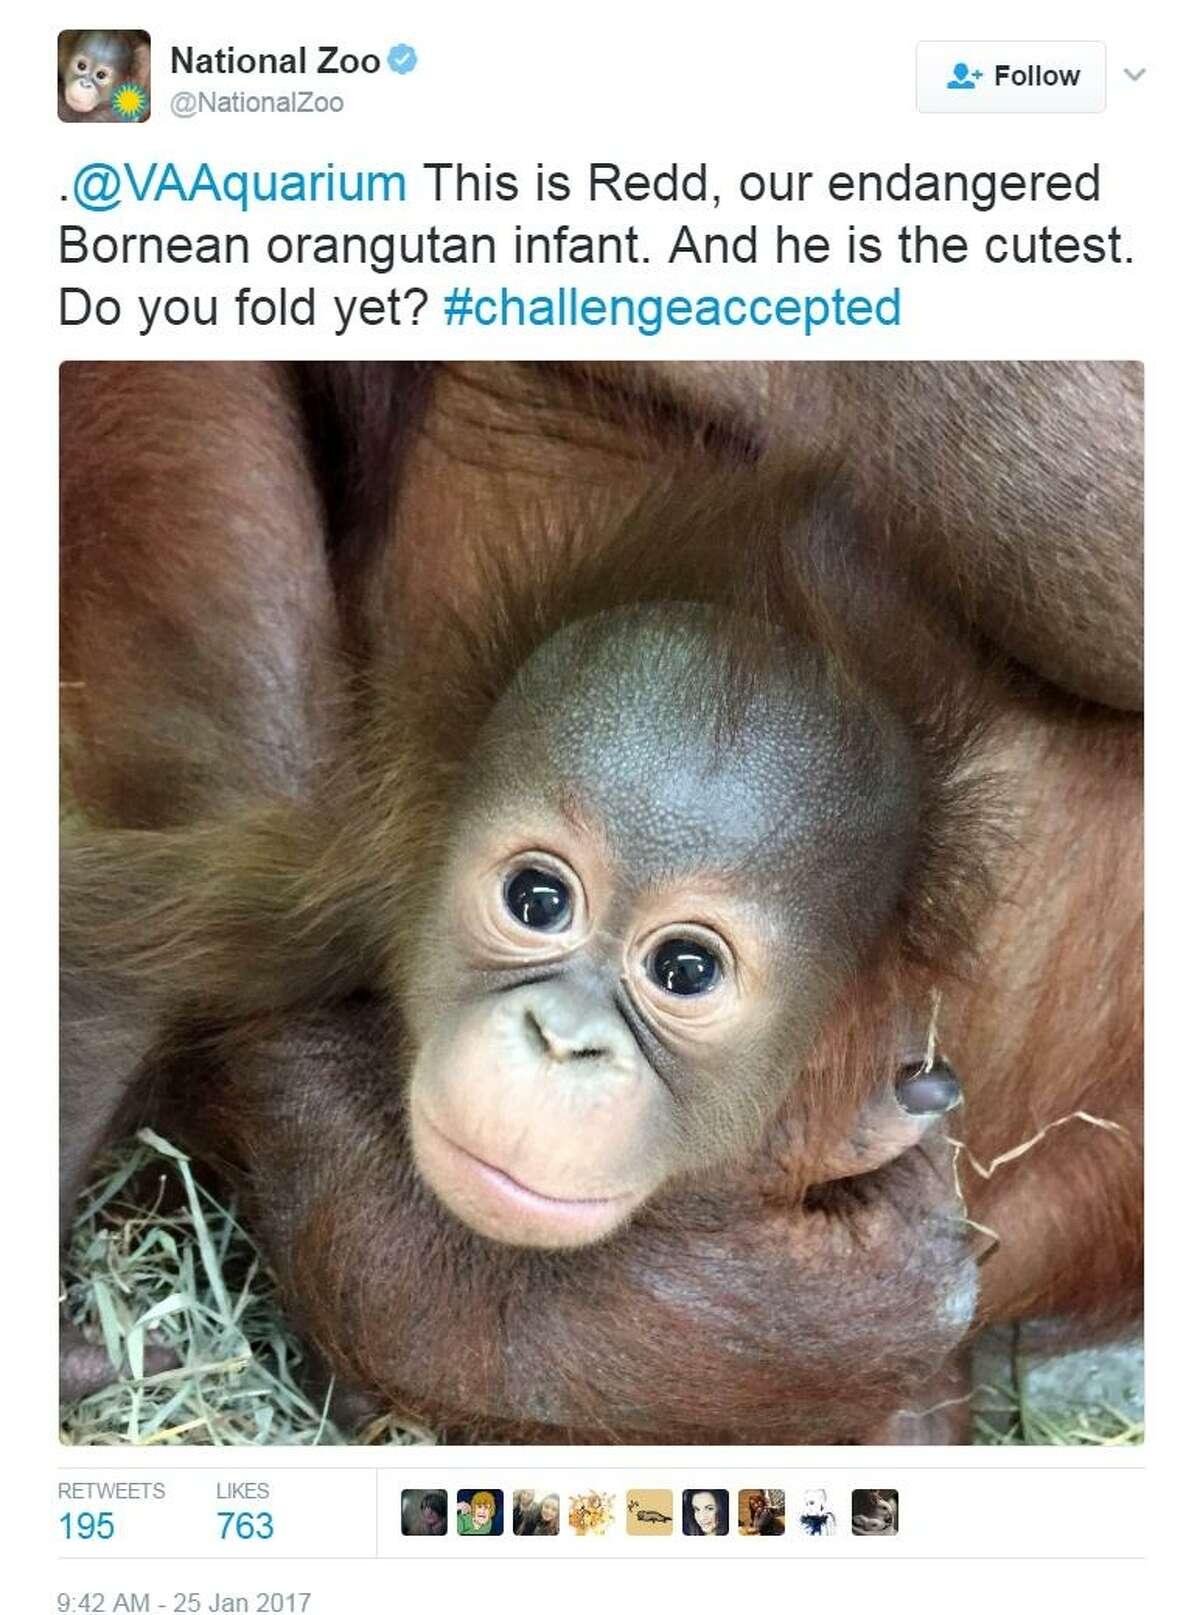 National Zoo tweet of Redd the orangutan for #CuteAnimalTweetOff.